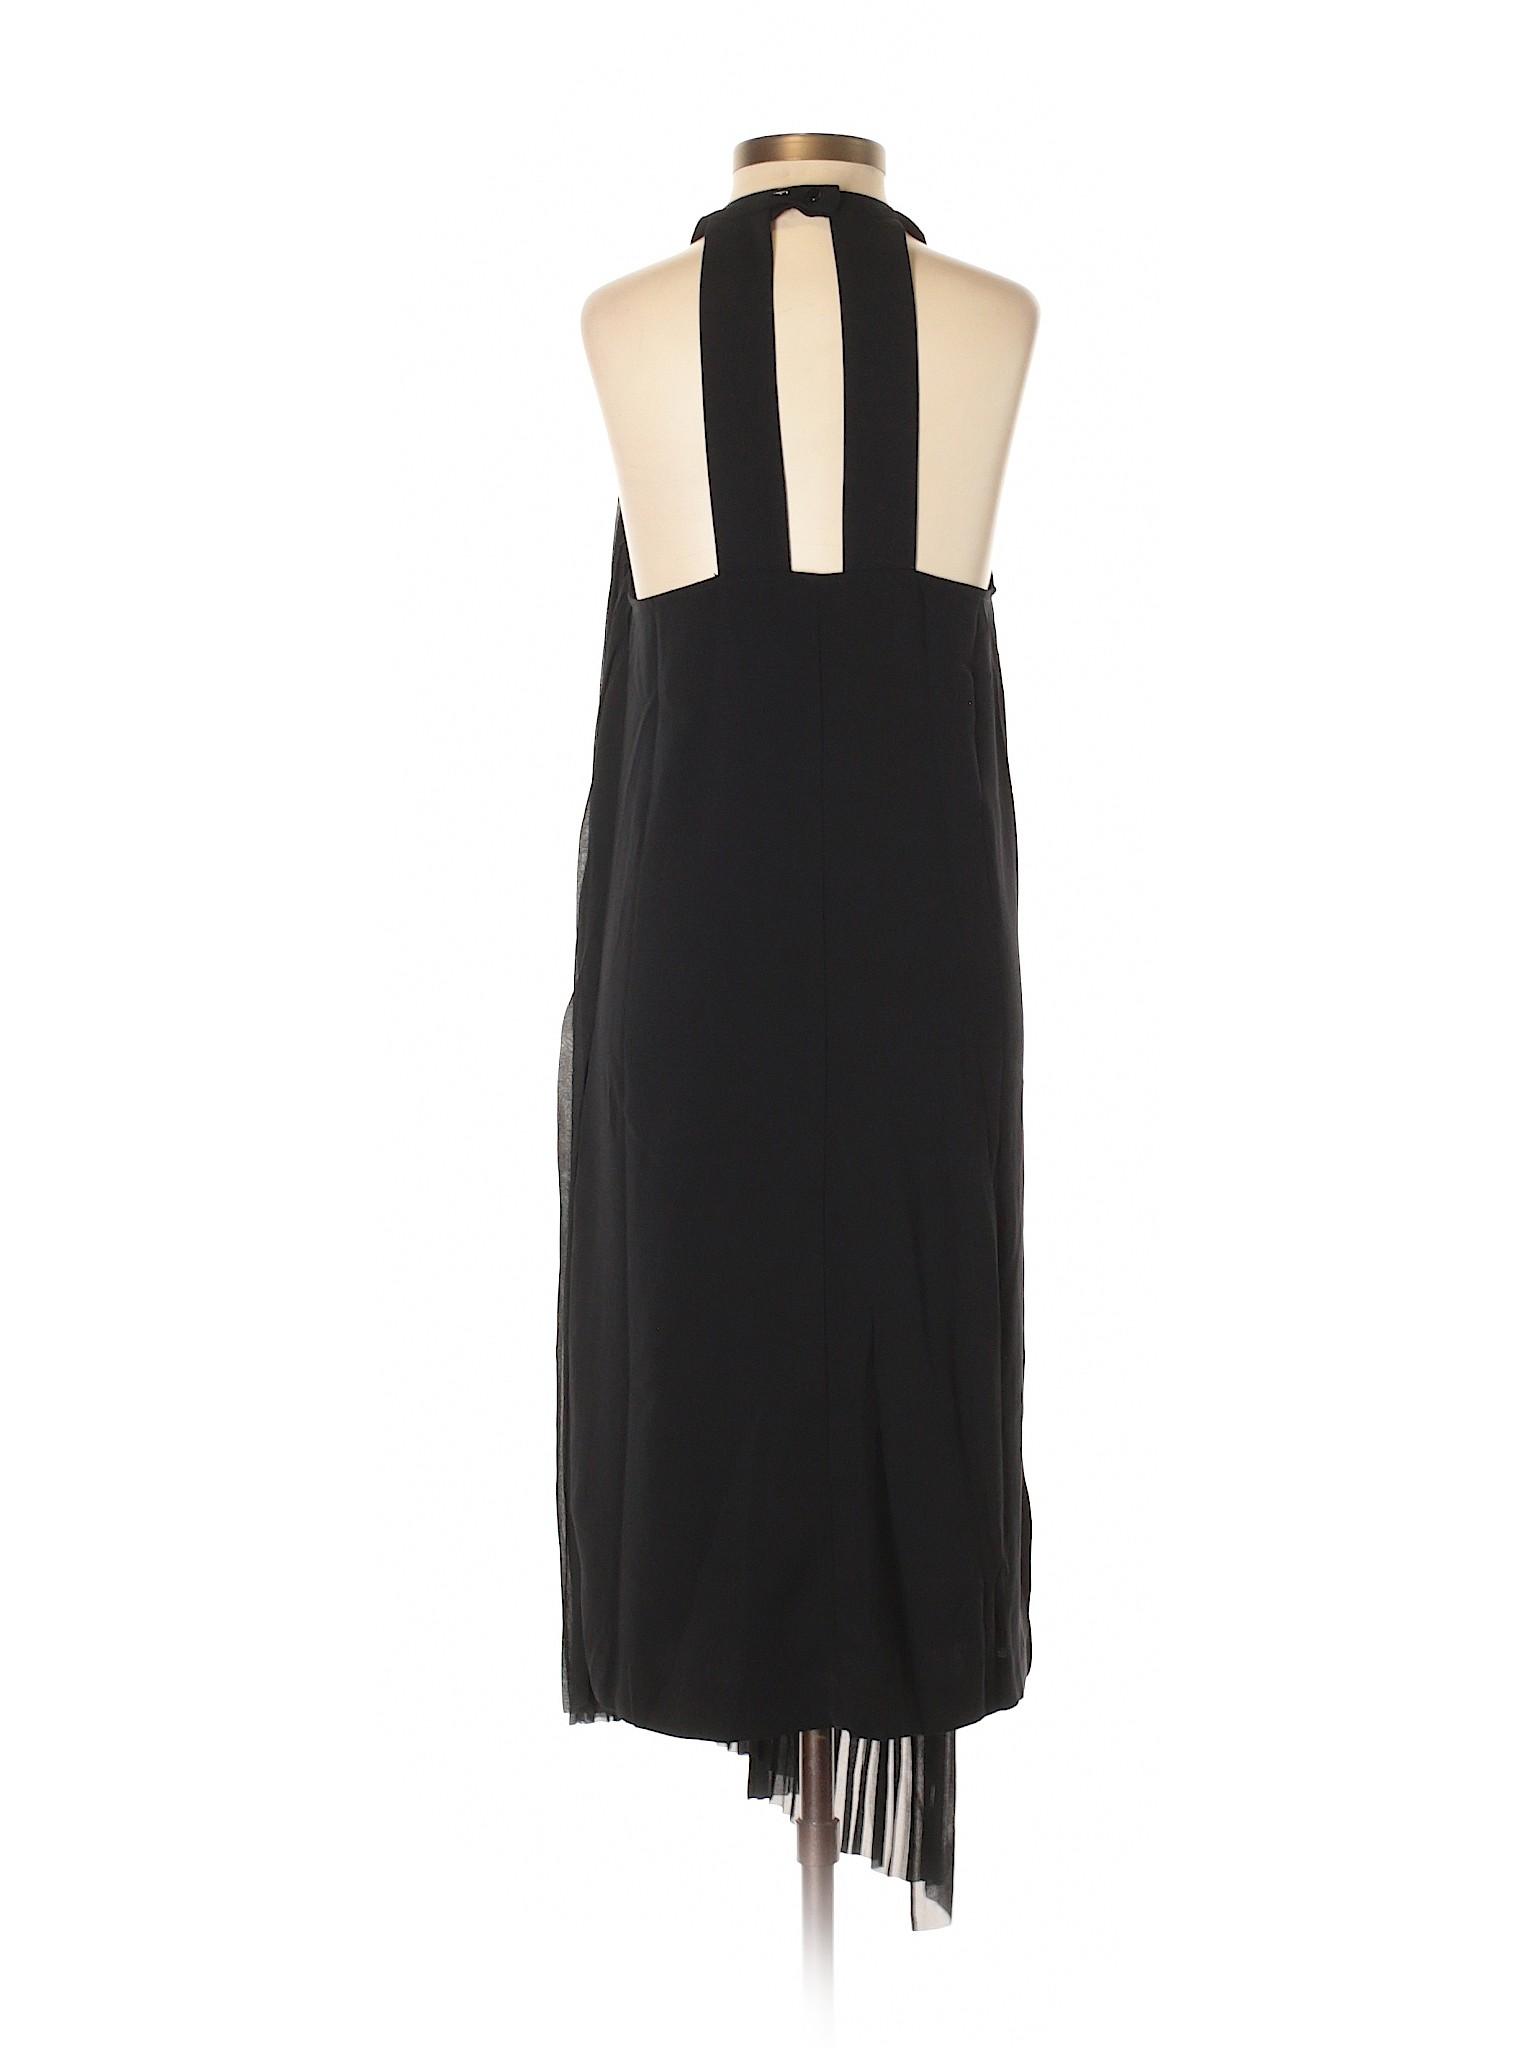 Boutique winter Casual Boutique Dress winter DKNY DKNY Casual Dress nPxXwrI0Tn